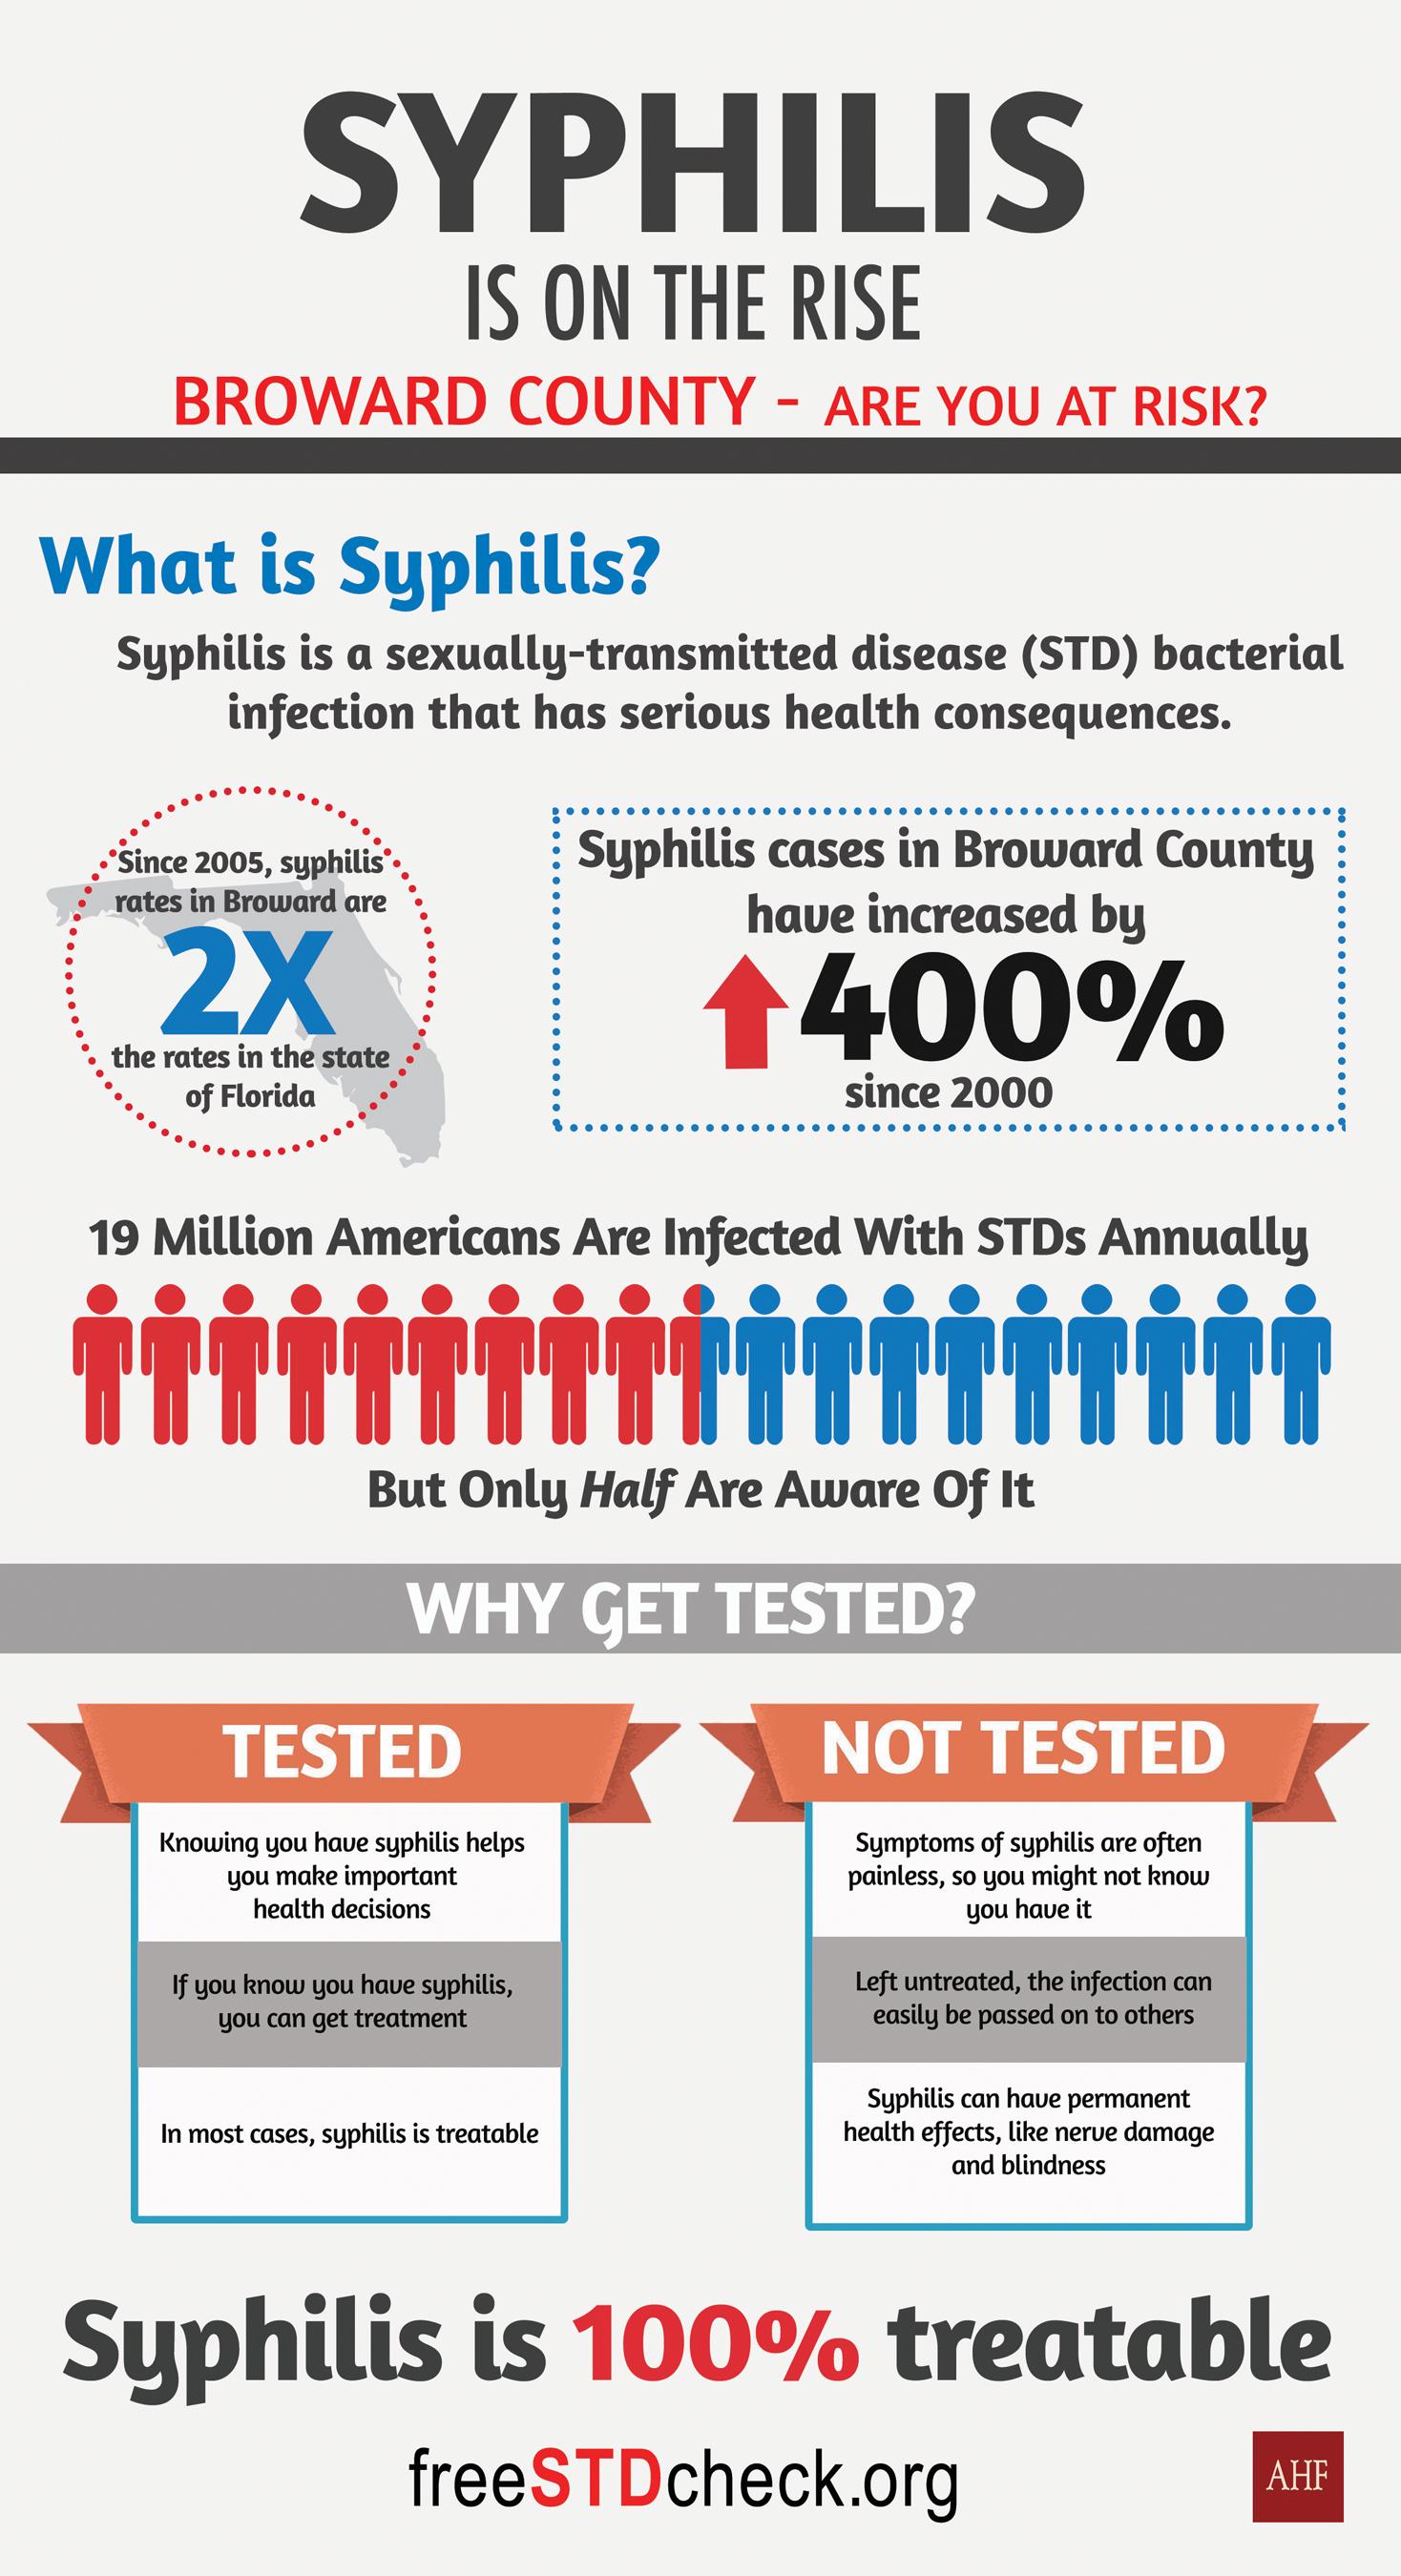 AHF: Broward's High Syphilis Rate Spurs Educational Mailer ...